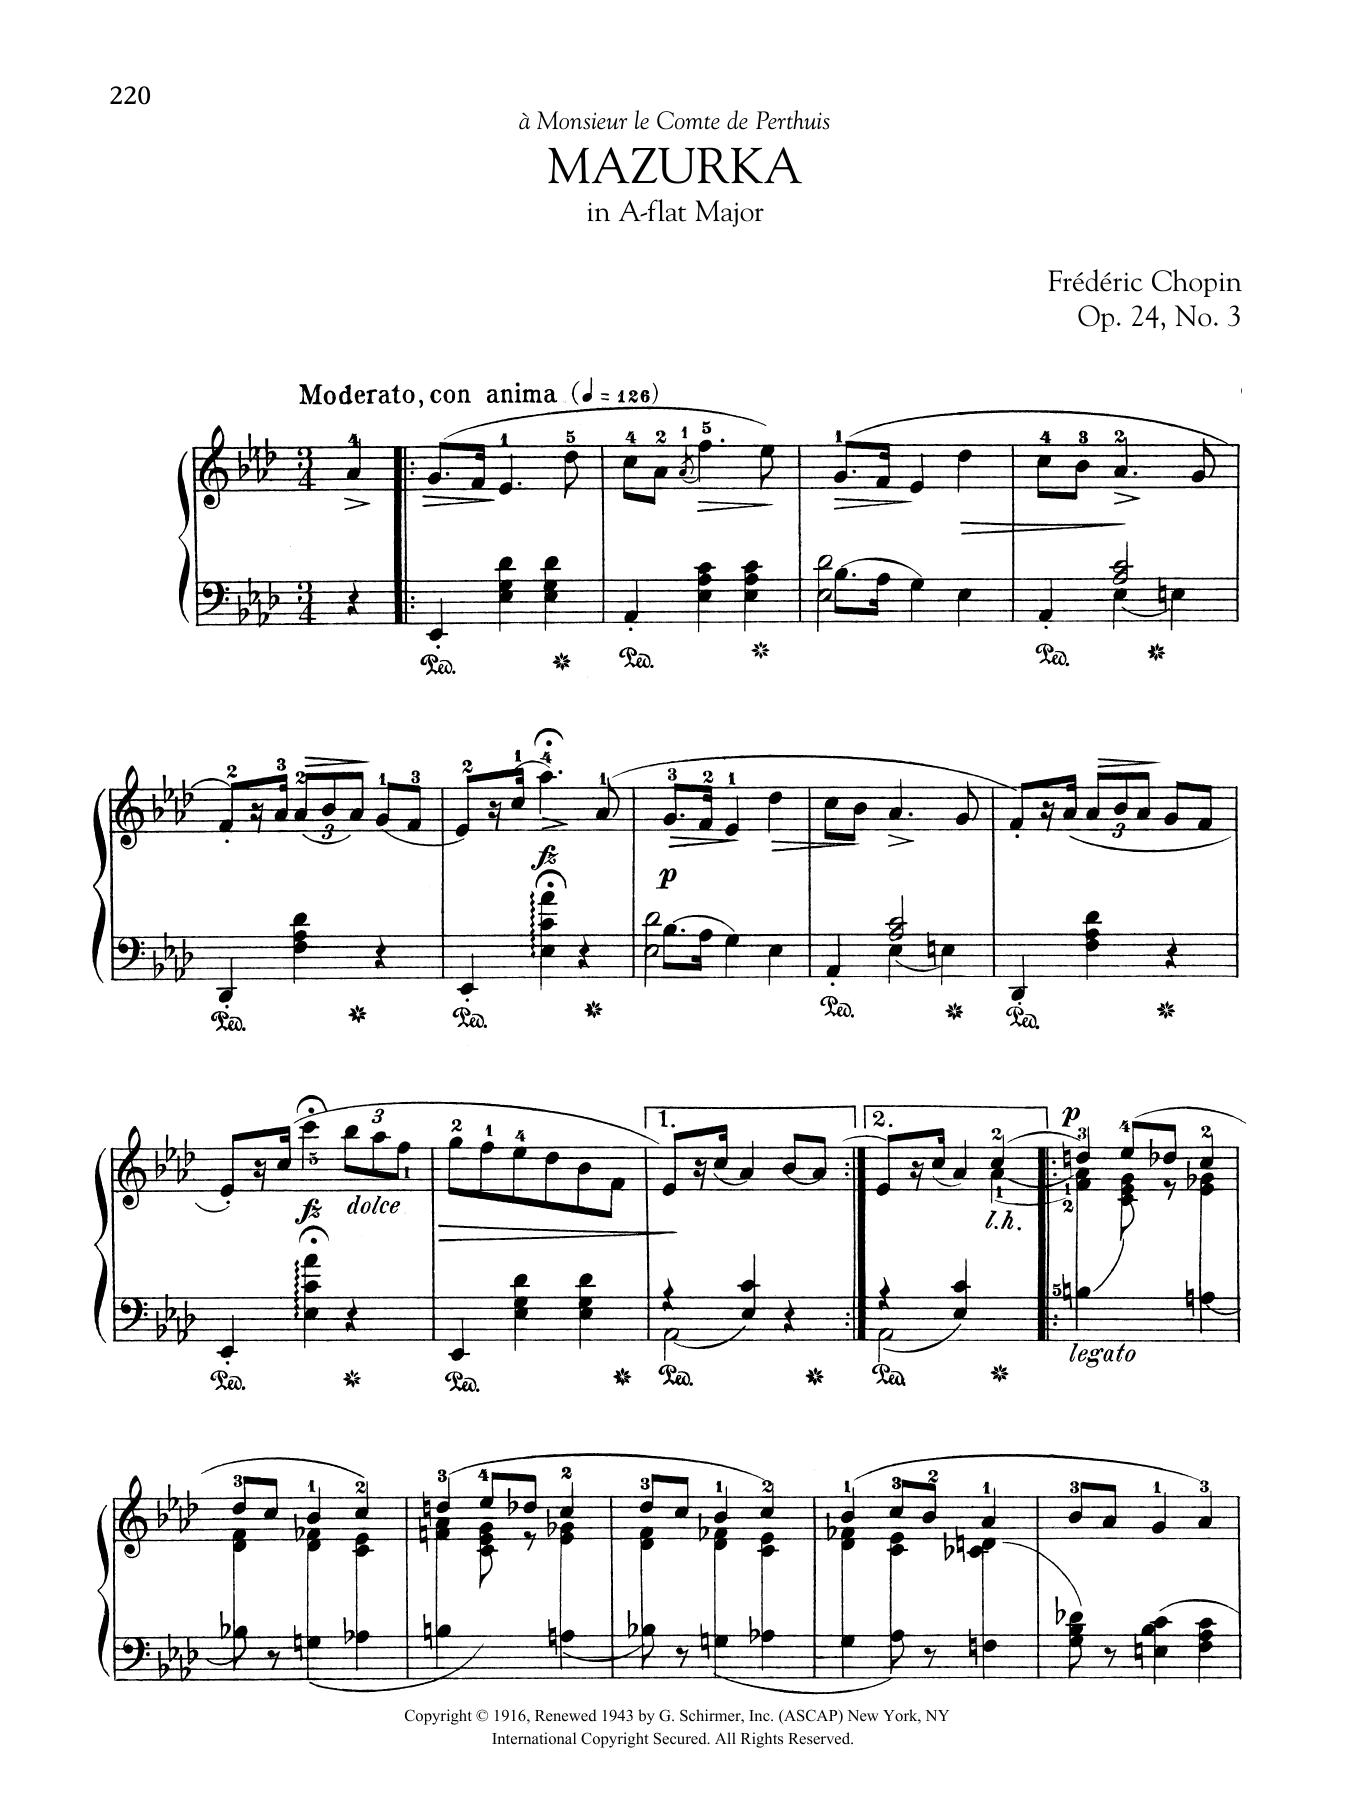 Mazurka in A-flat Major, Op. 24, No. 3 Sheet Music